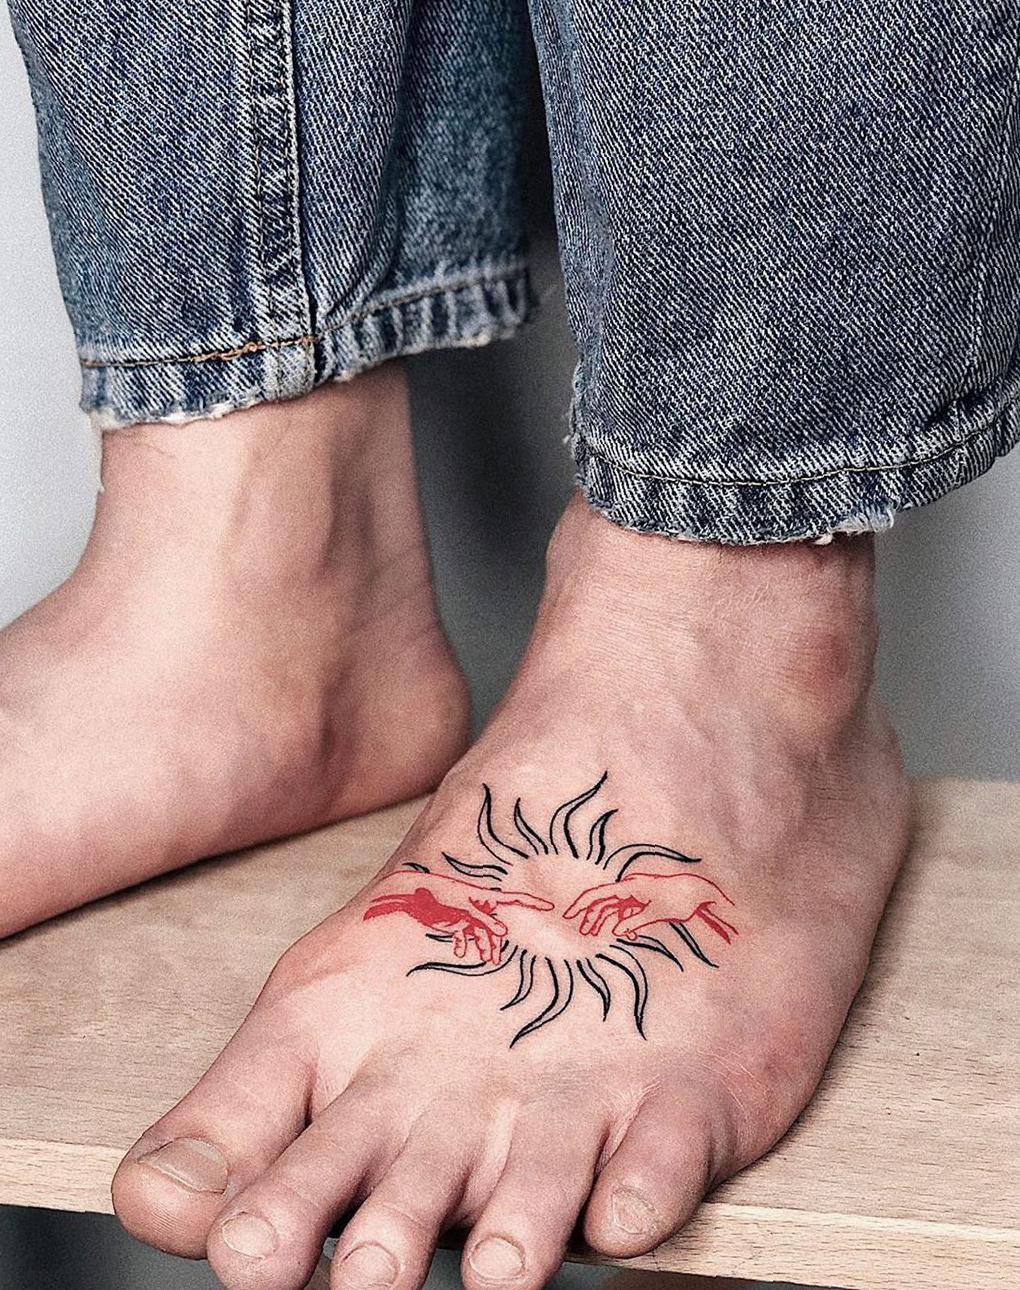 Best Leg Tattoo Idea Images for Women tattoo, tattoo images, leg tattoo, women tattoo, tattoo design